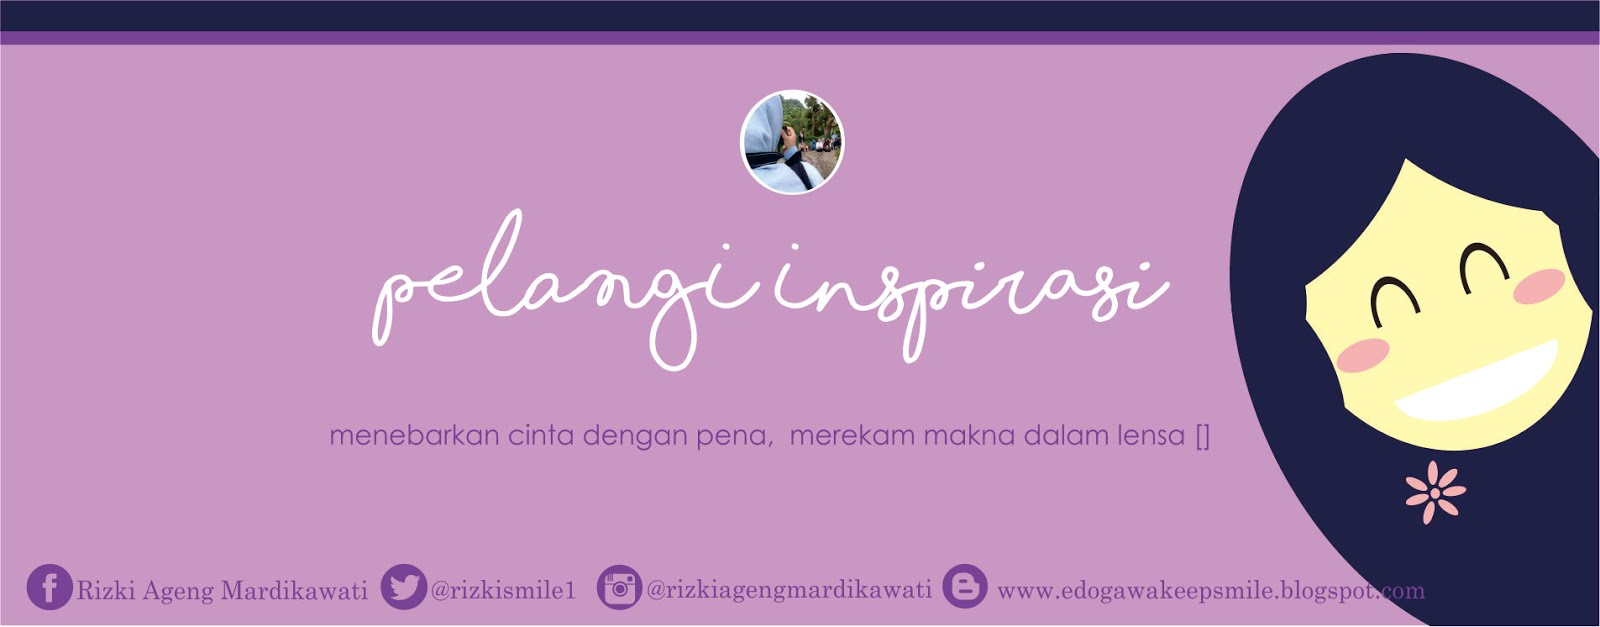 Pelangi Inspirasi